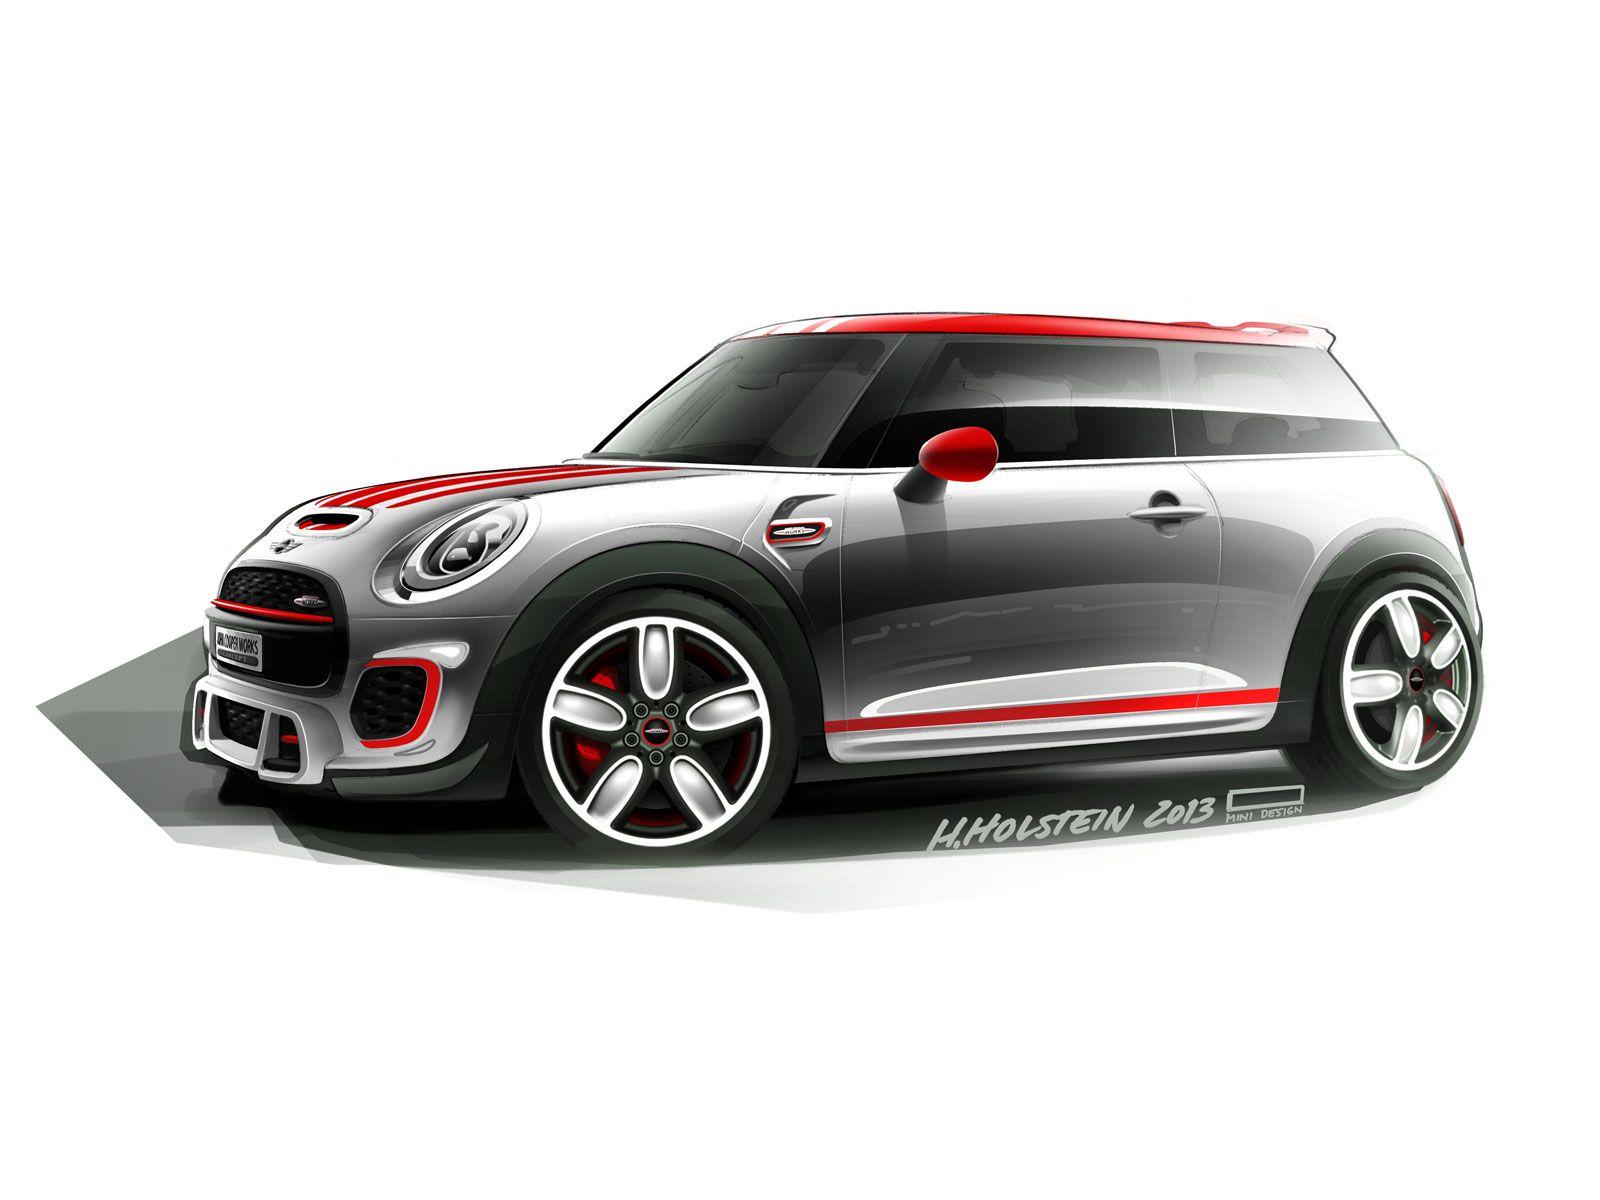 Mini John Cooper Works Concept Sketch Car Body Design Sketch